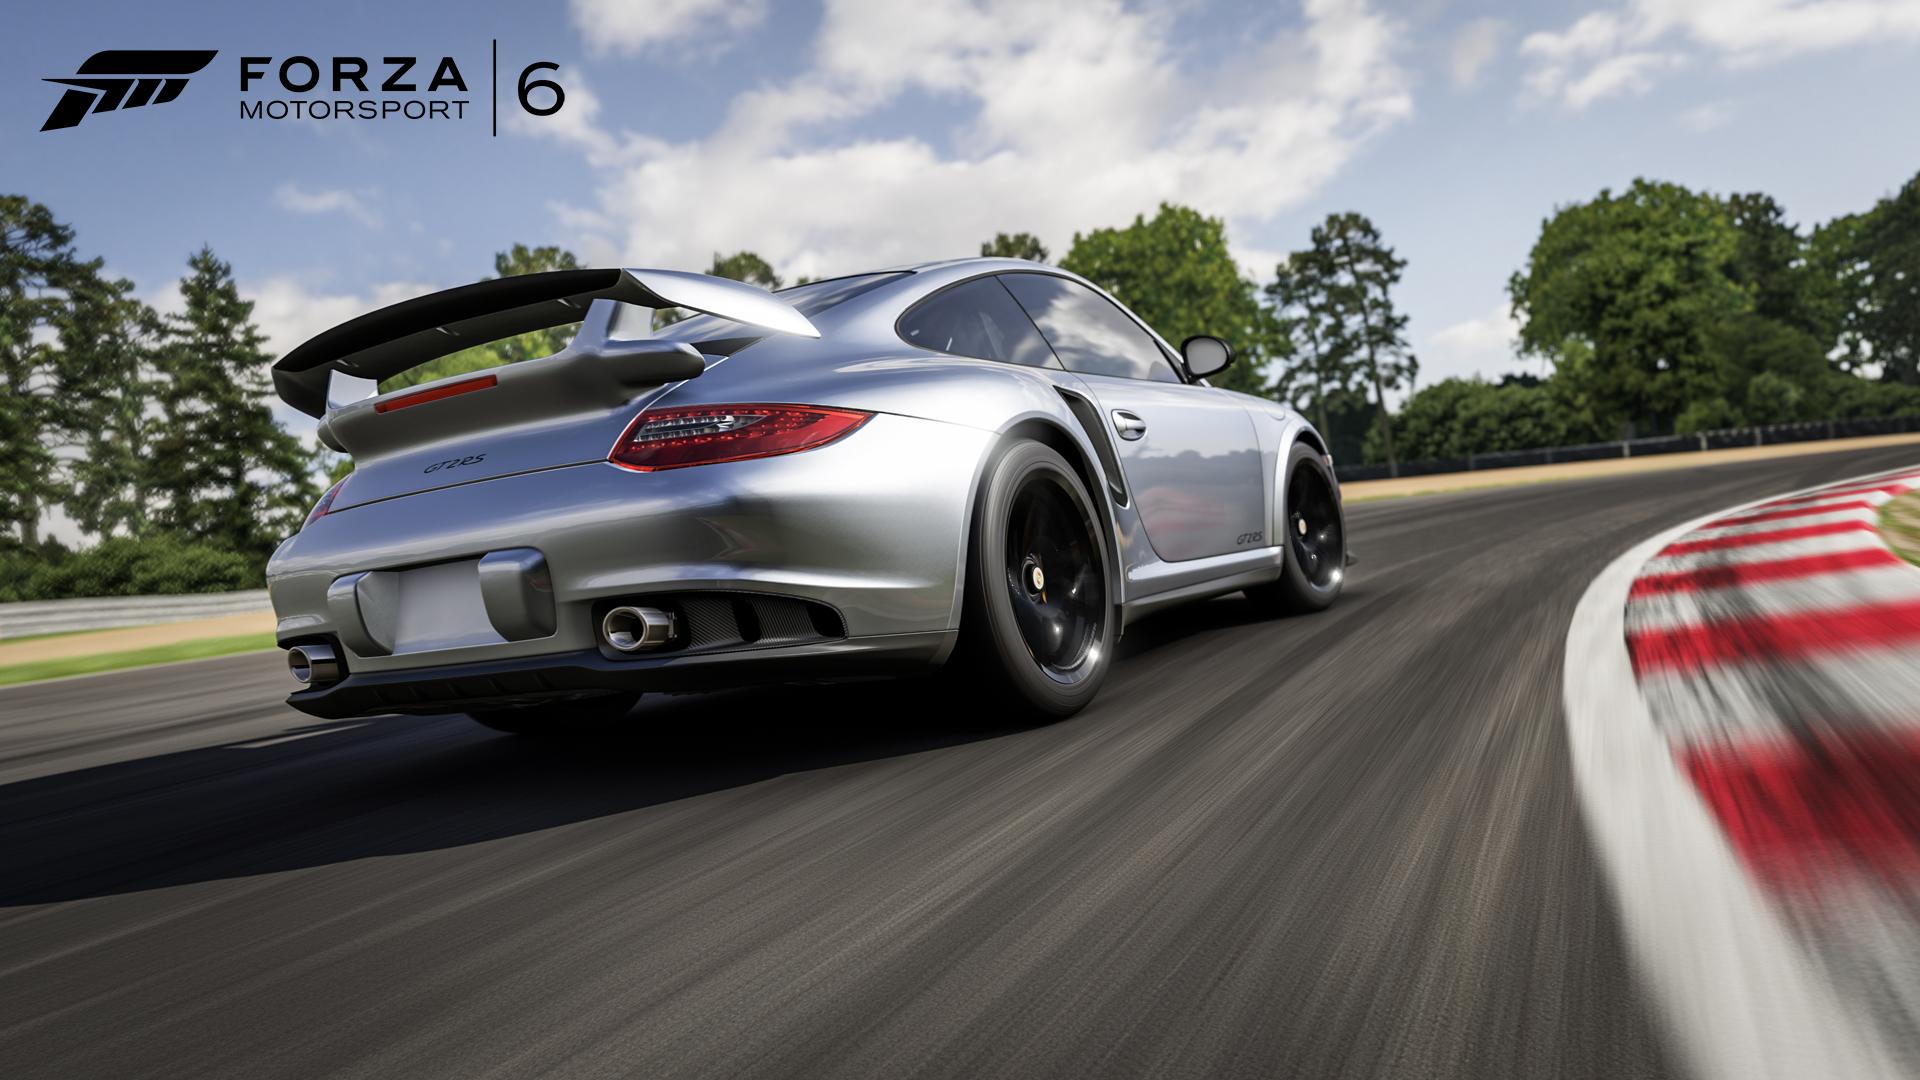 8acfa7da-3b63-4d3f-b61b-5125bccee12e.jpg?n=PorscheEXP_POR_911GT2_12_Forza6_WM Cozy Porsche 911 Gt2 Rs Nürburgring Cars Trend